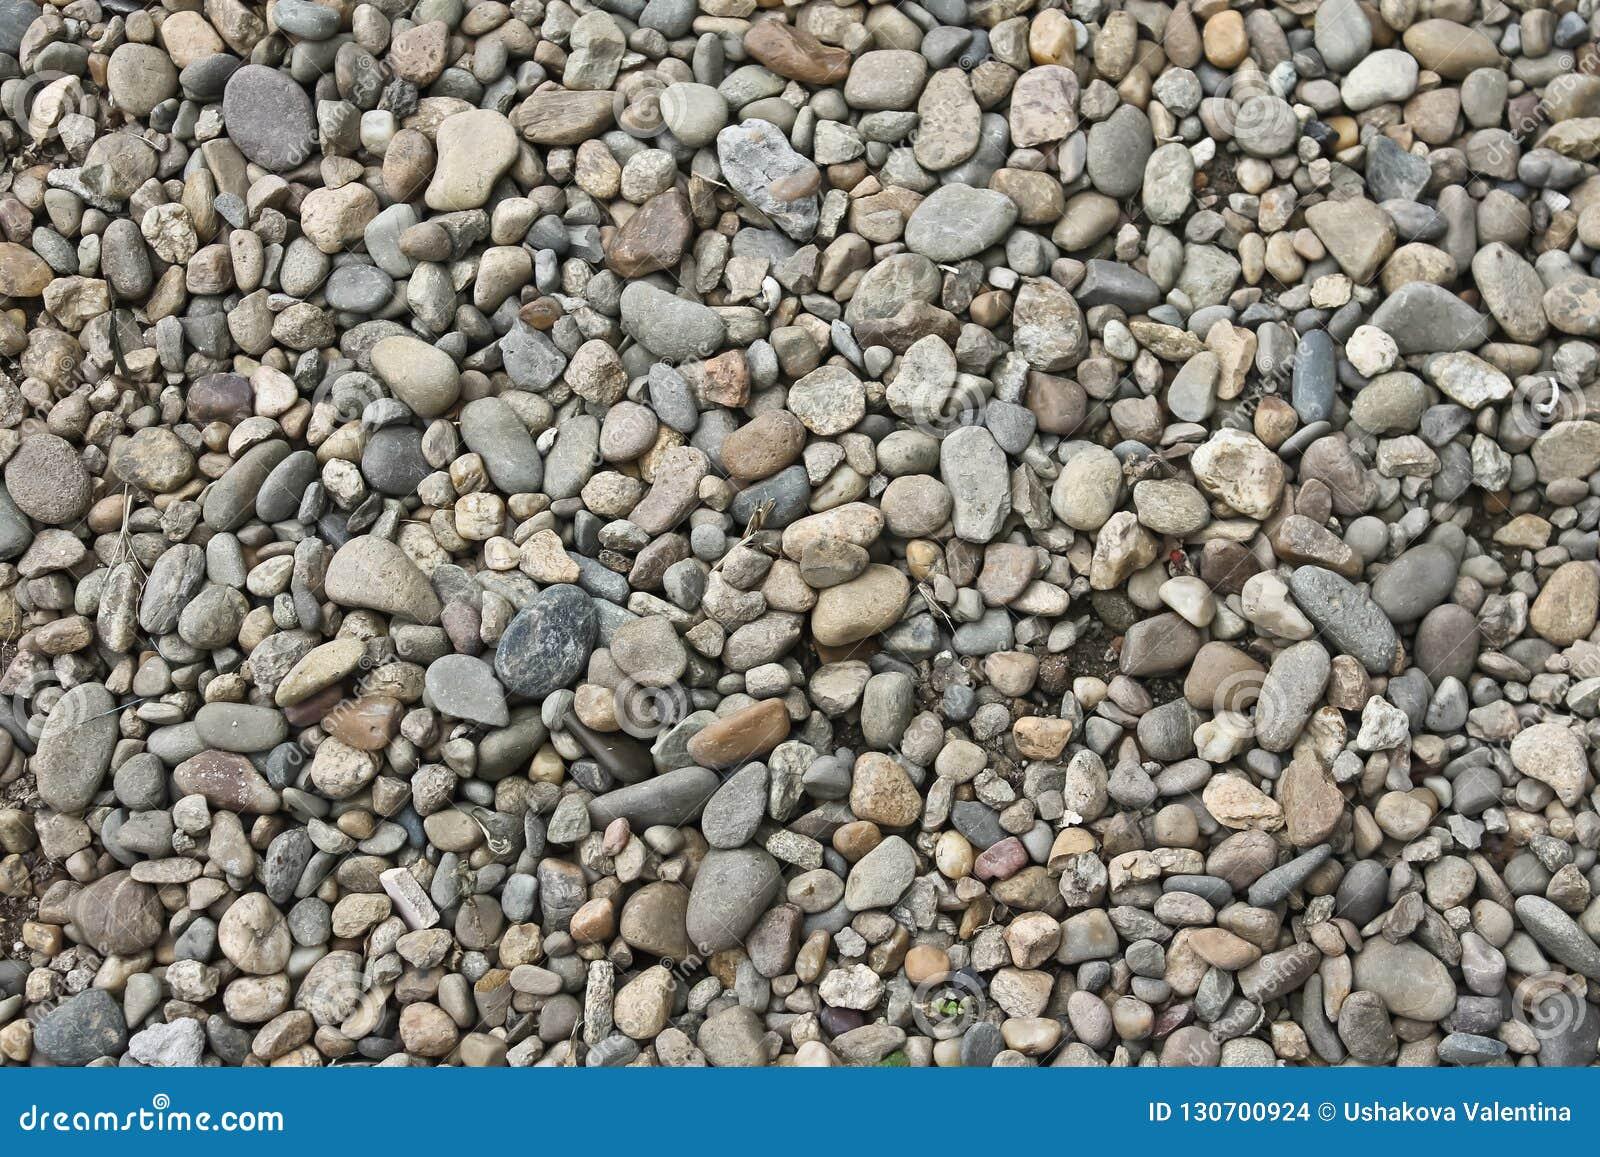 Pebbles, beach, stone, pebble, background, texture, rock, stones, sea, pattern, gravel